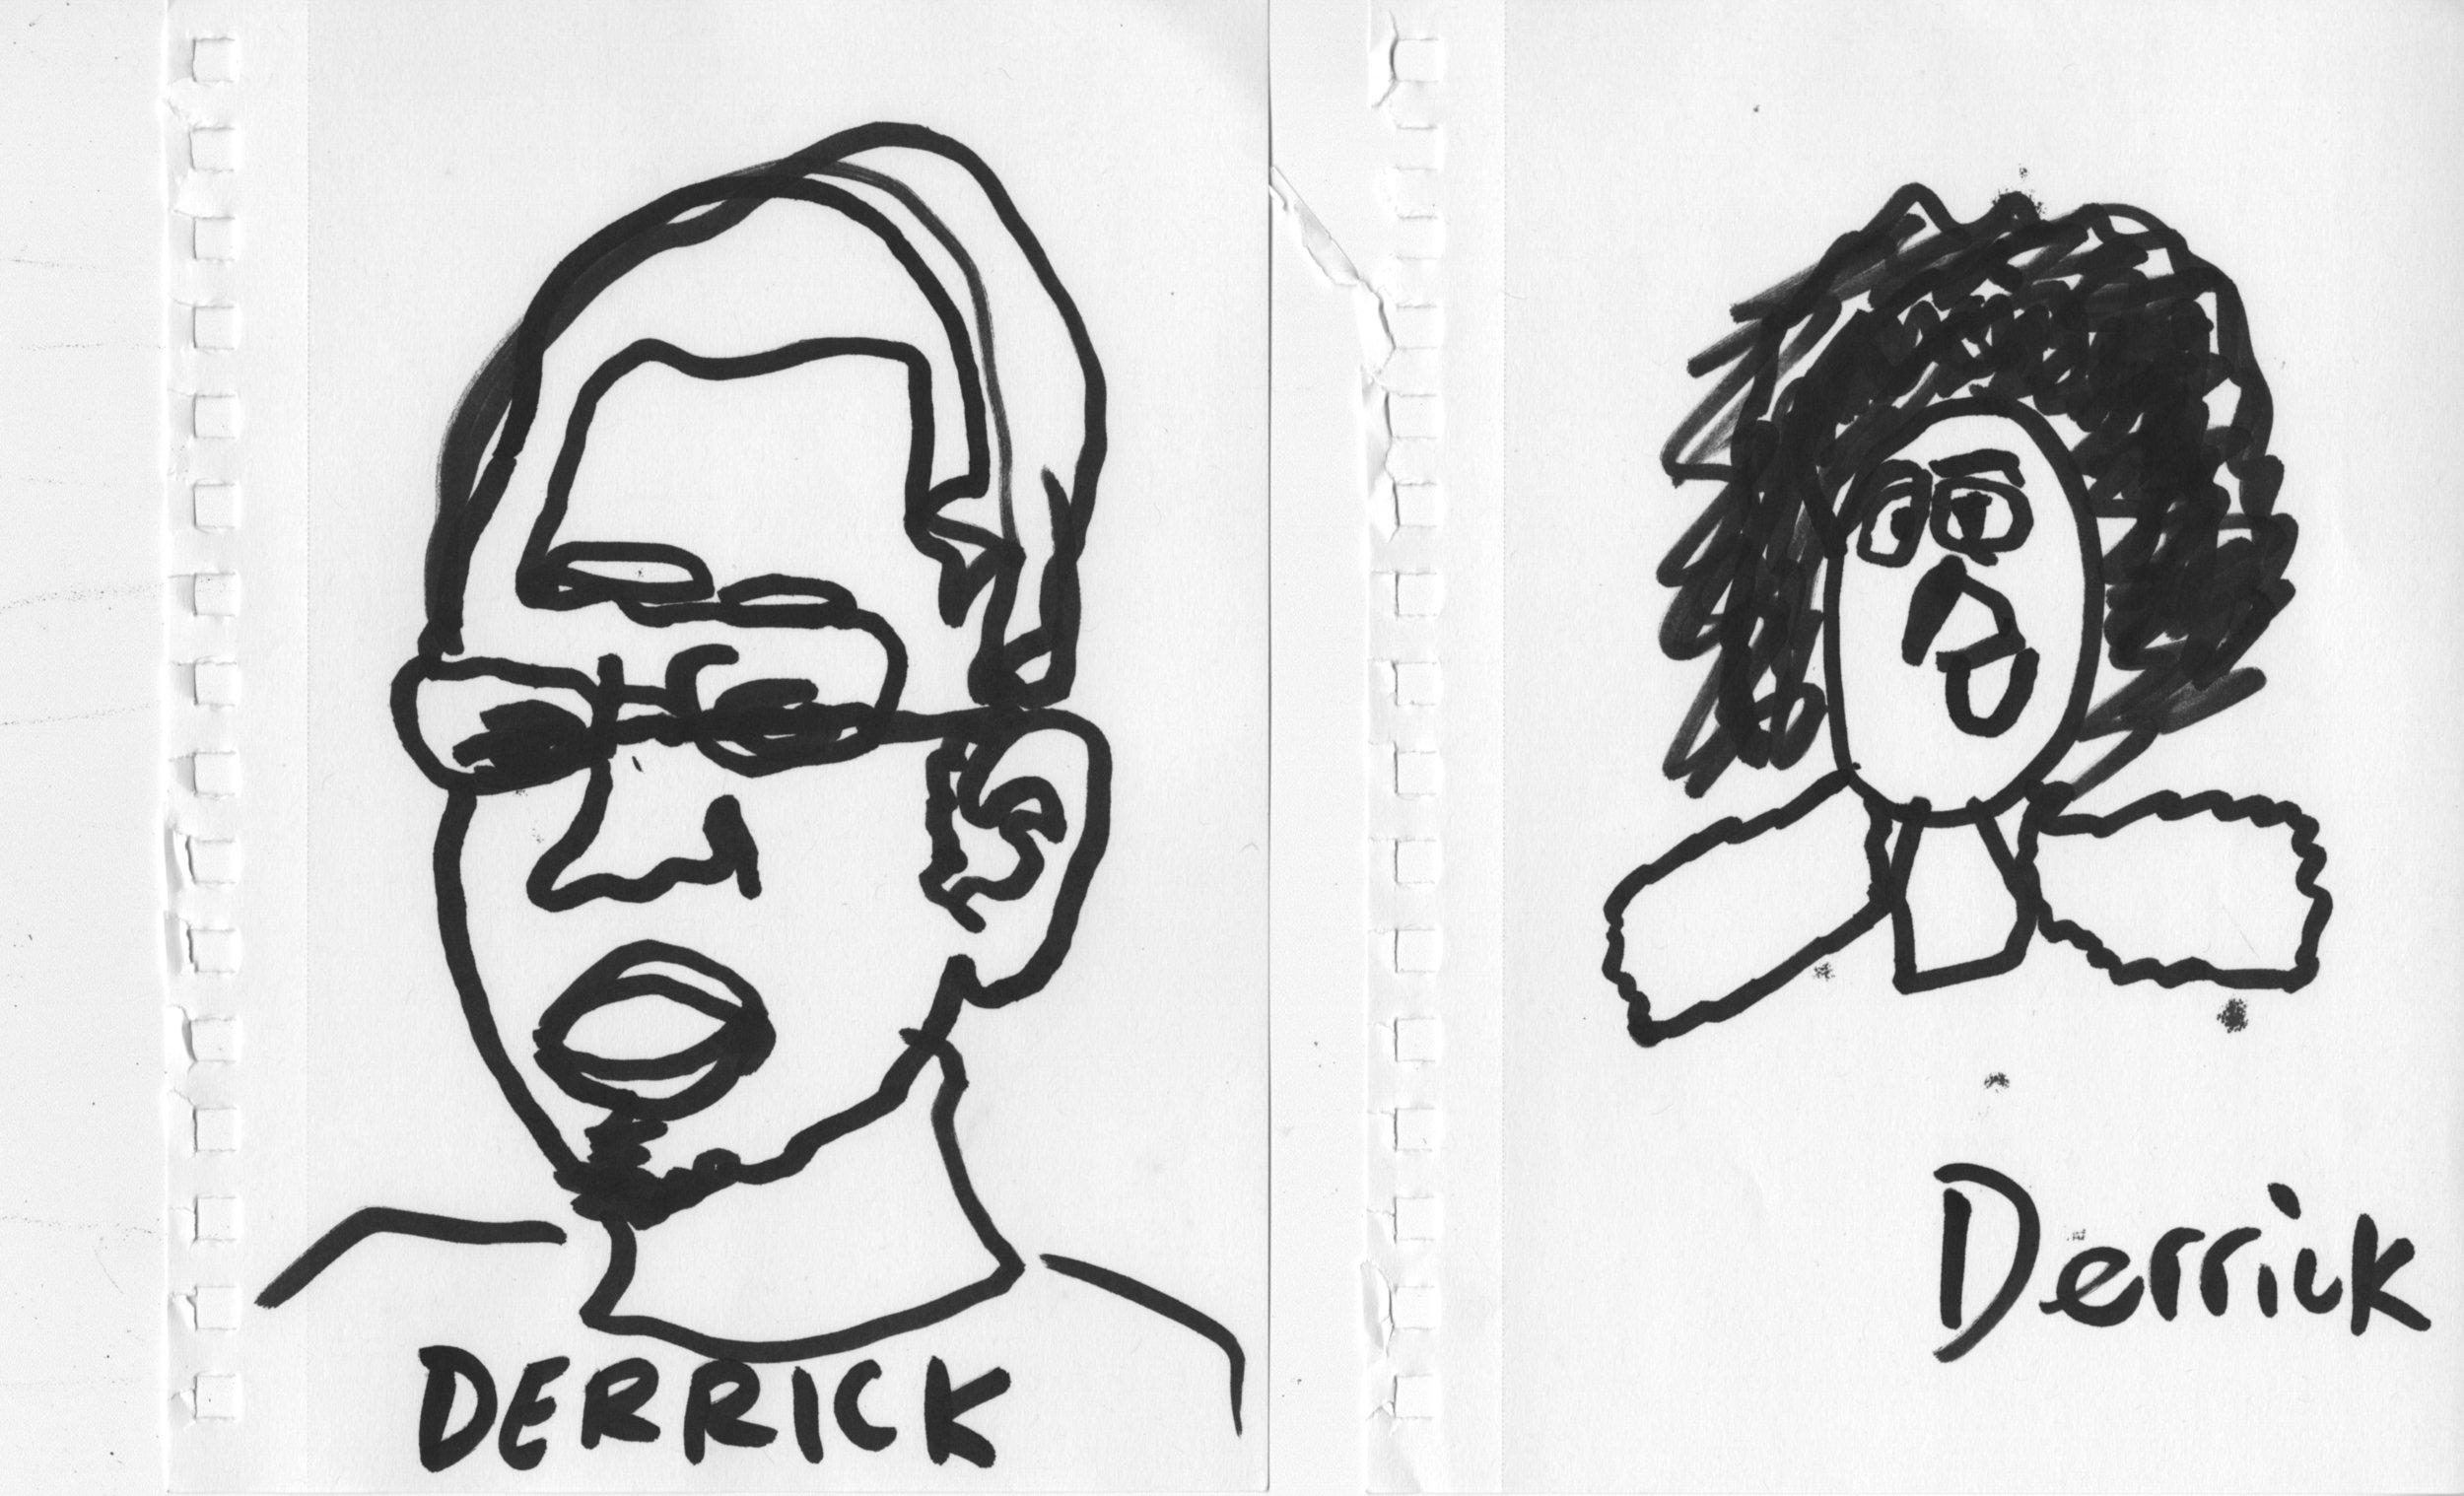 22_Derrick_Derrick.jpg